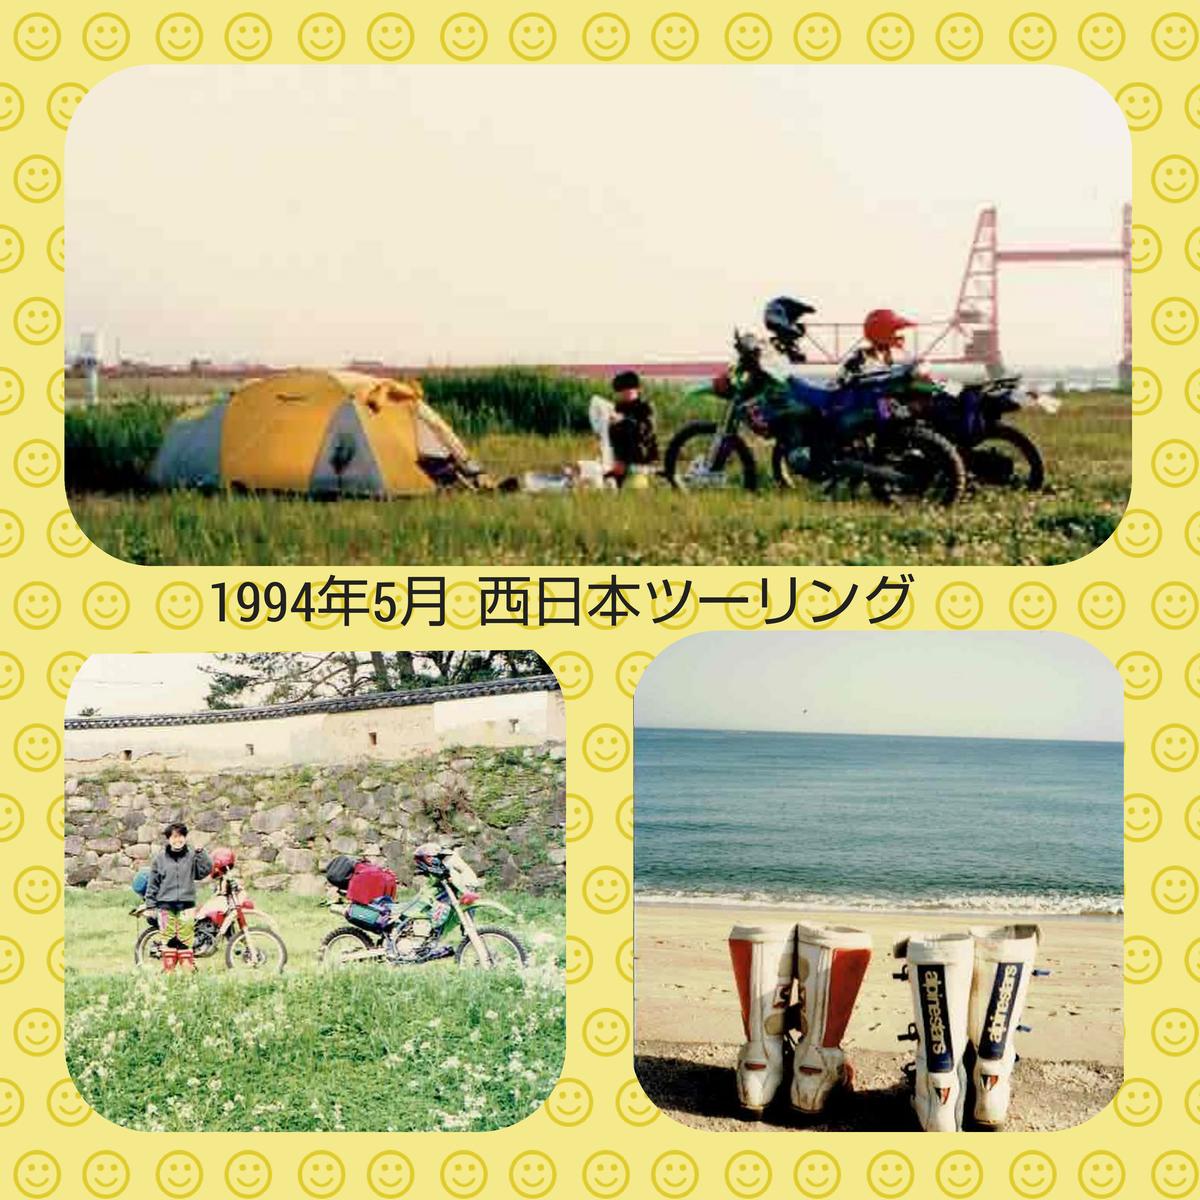 f:id:hmokuyobi:20200110134721j:plain